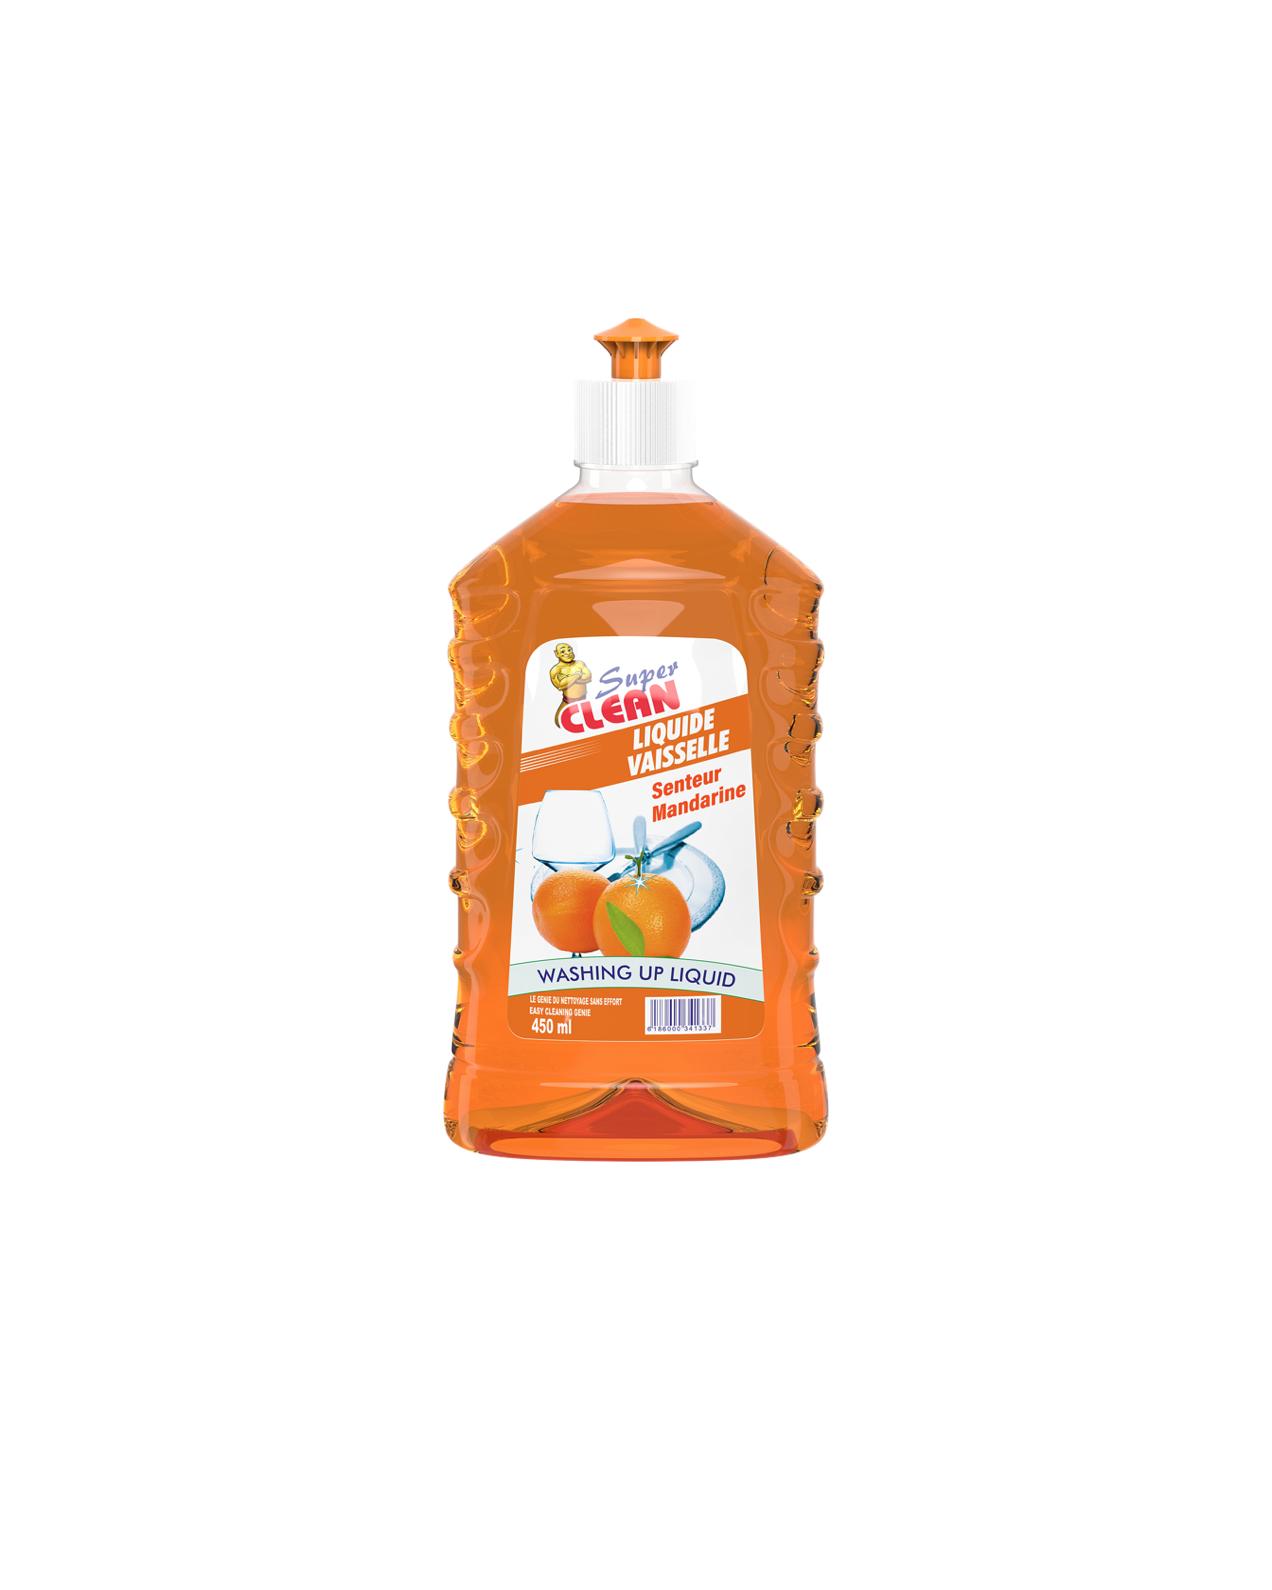 SUPER CLEAN_Liquide Mandarine 450ml_siprochim